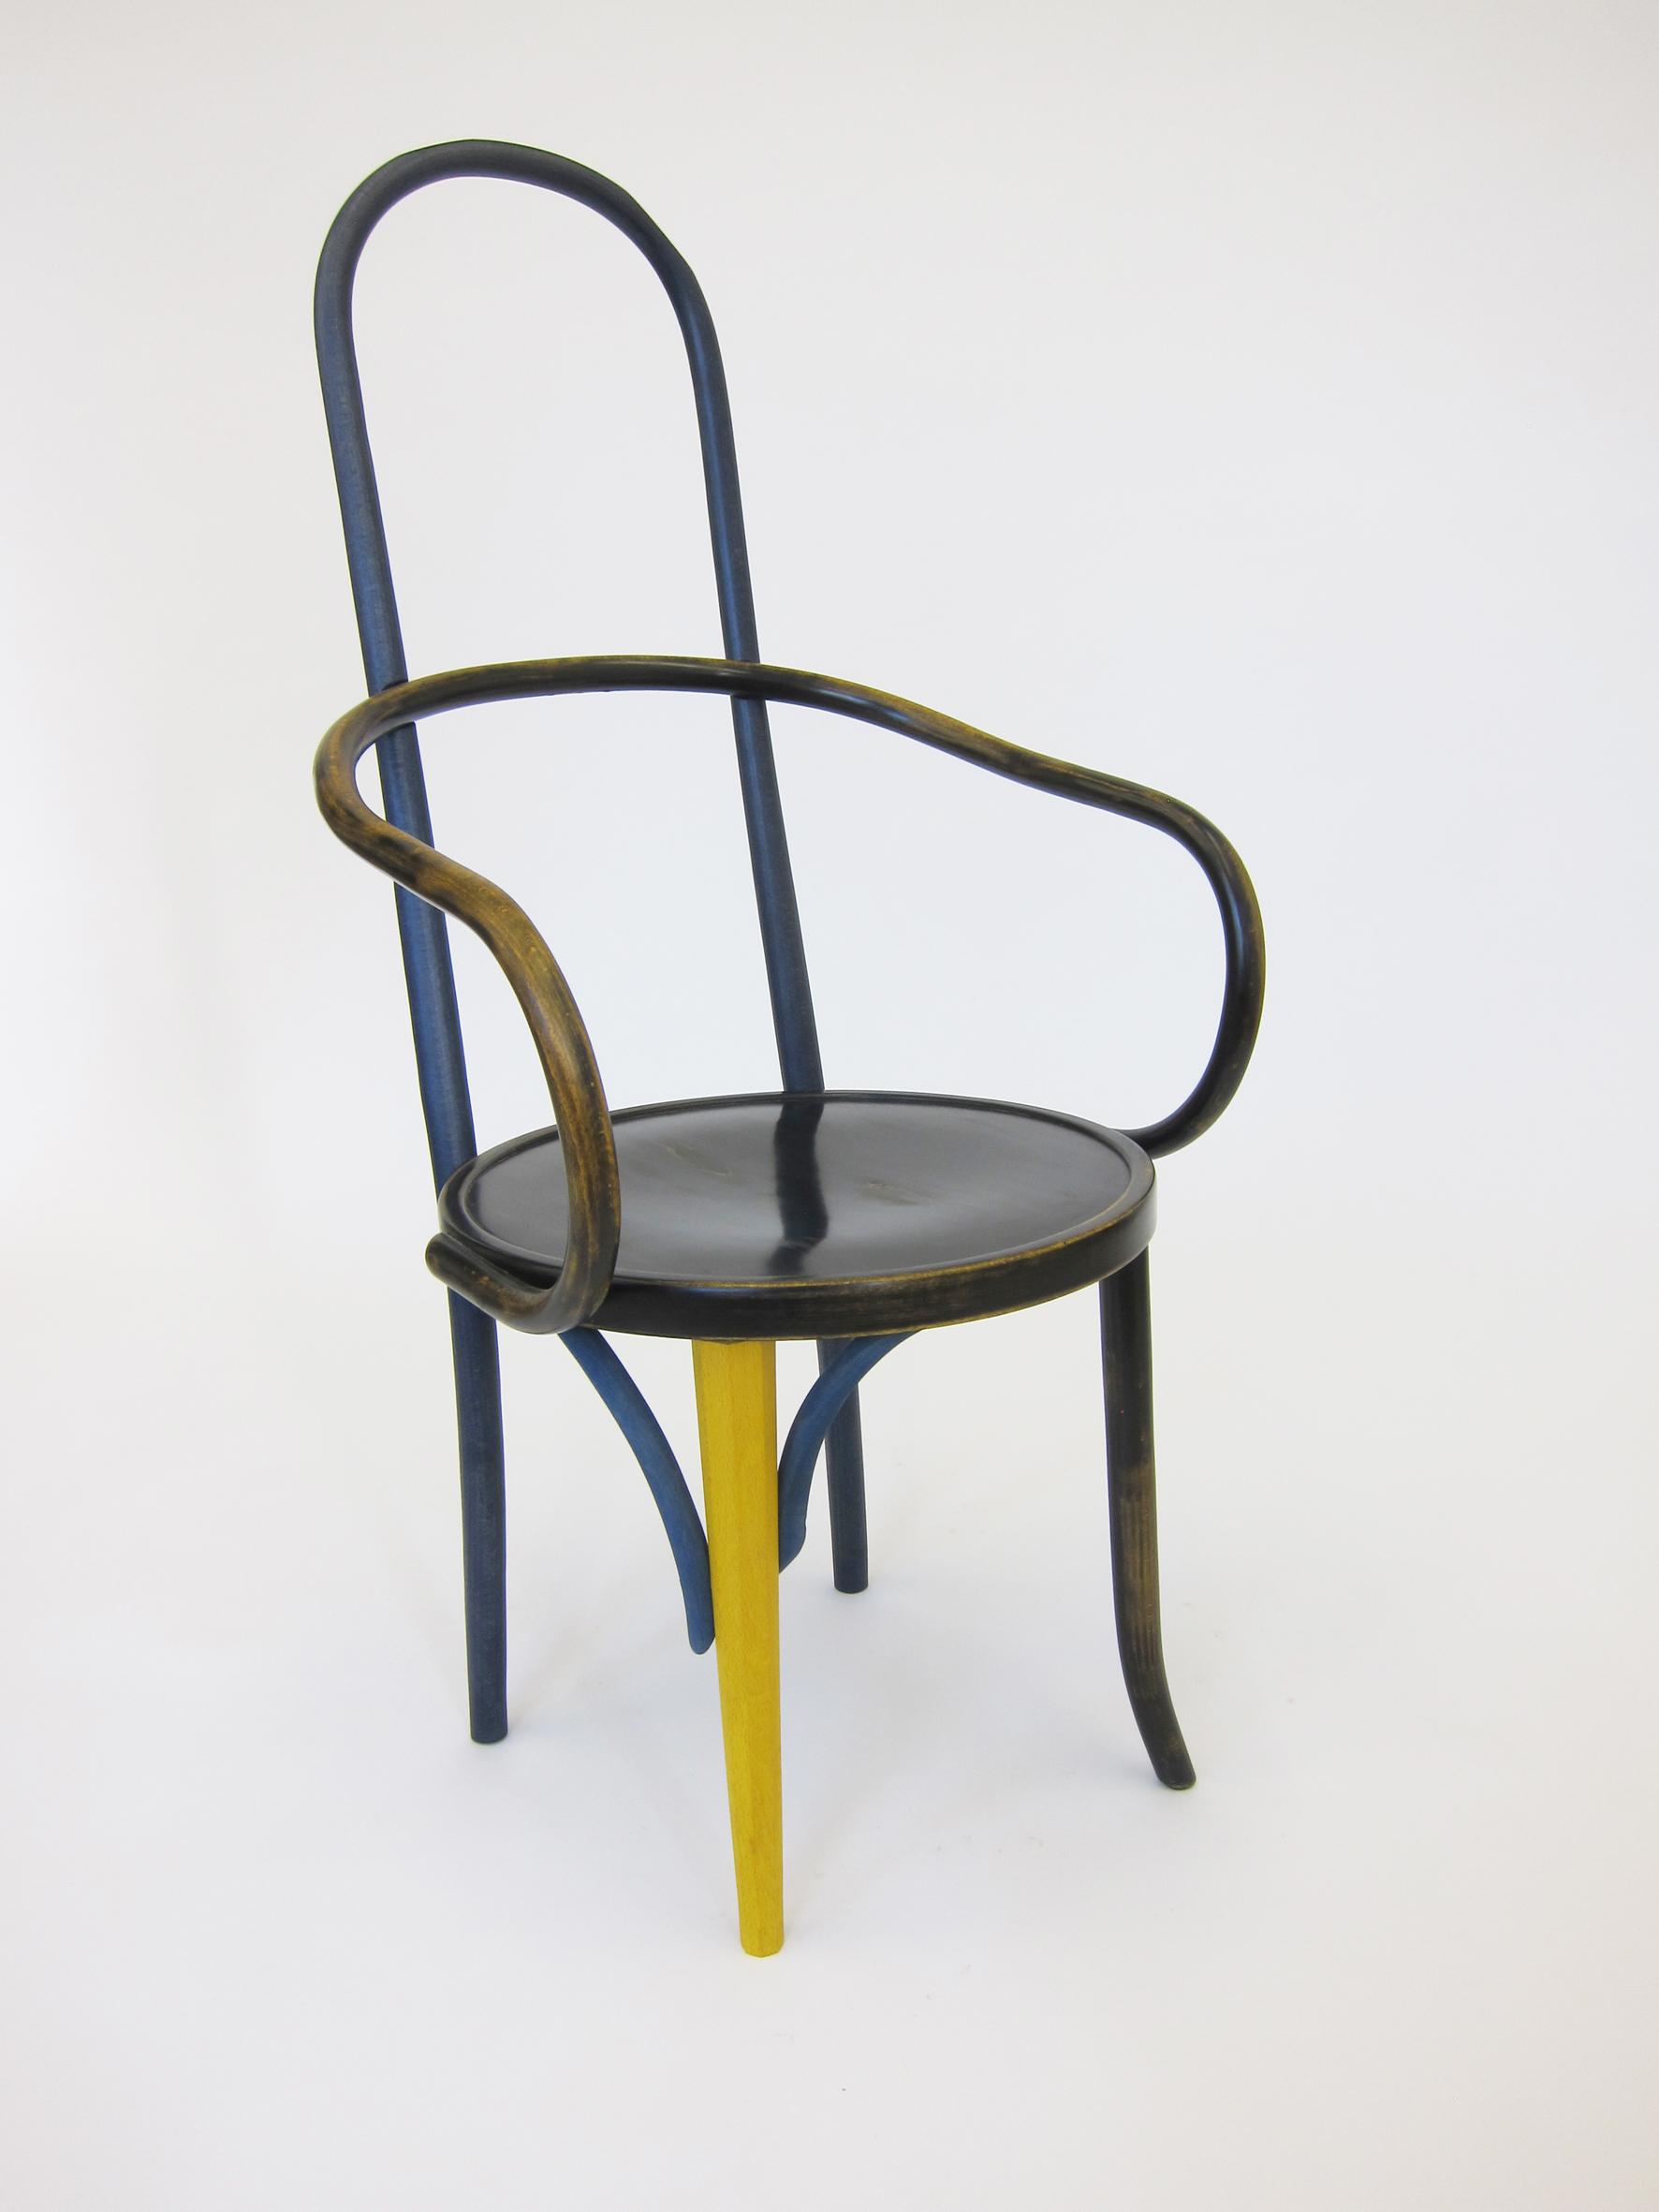 High - Mundus 2013, appropriated mundus chair, 116 x 56 x 60 cm